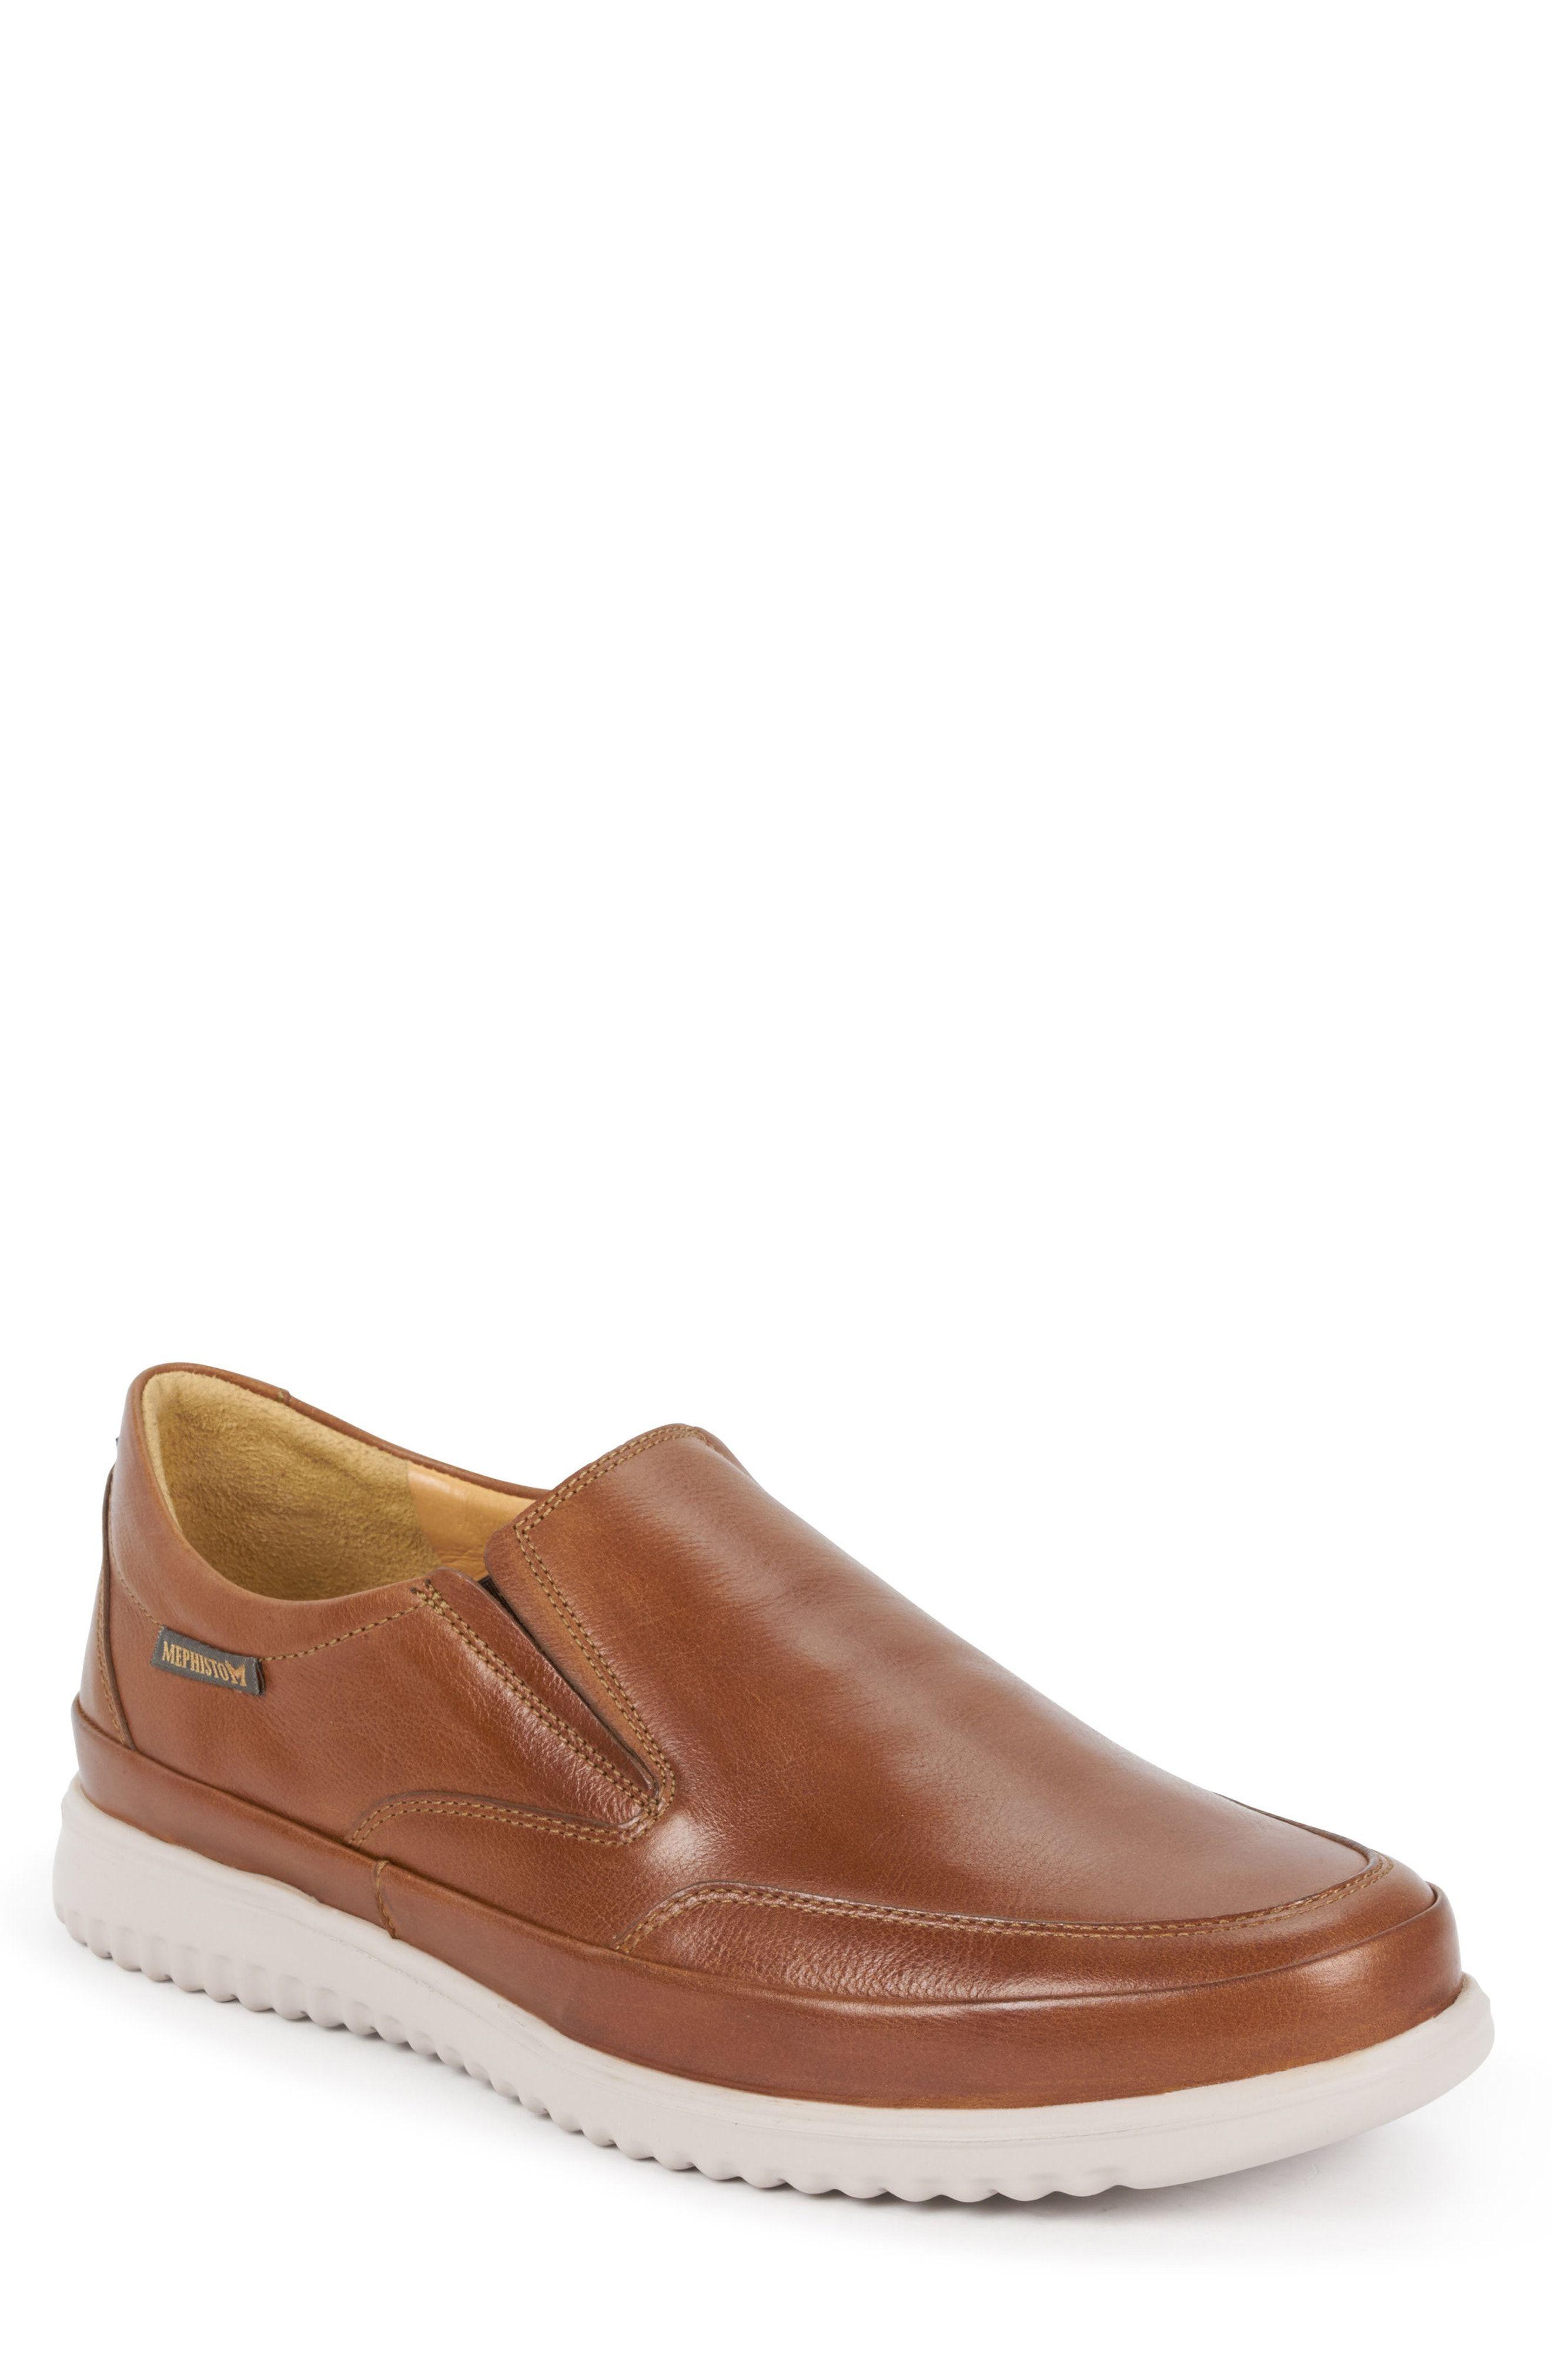 e11be3966cf MEPHISTO TWAIN SLIP-ON. #mephisto #shoes | Mephisto in 2019 ...